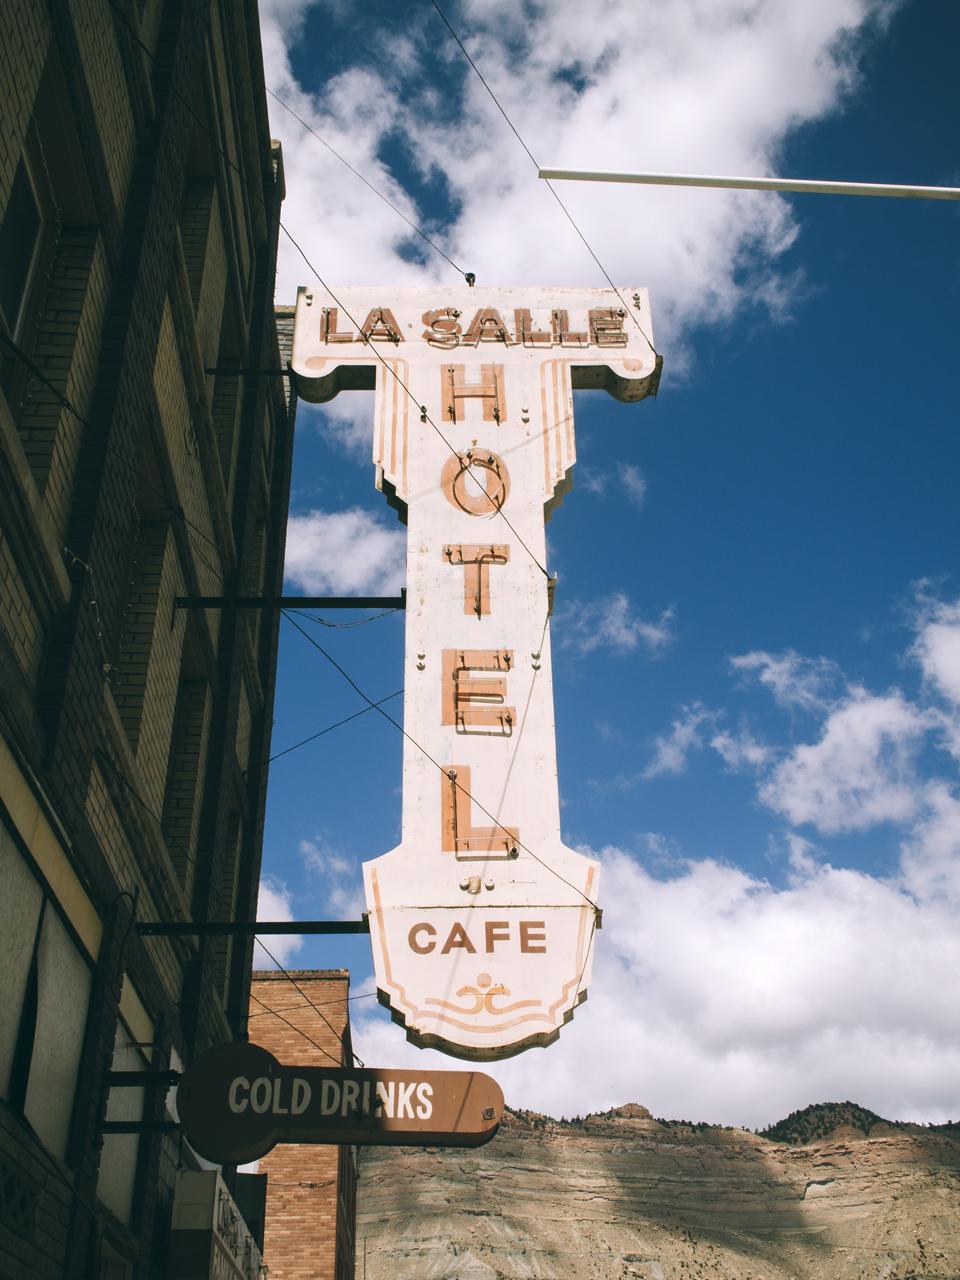 La Salle's